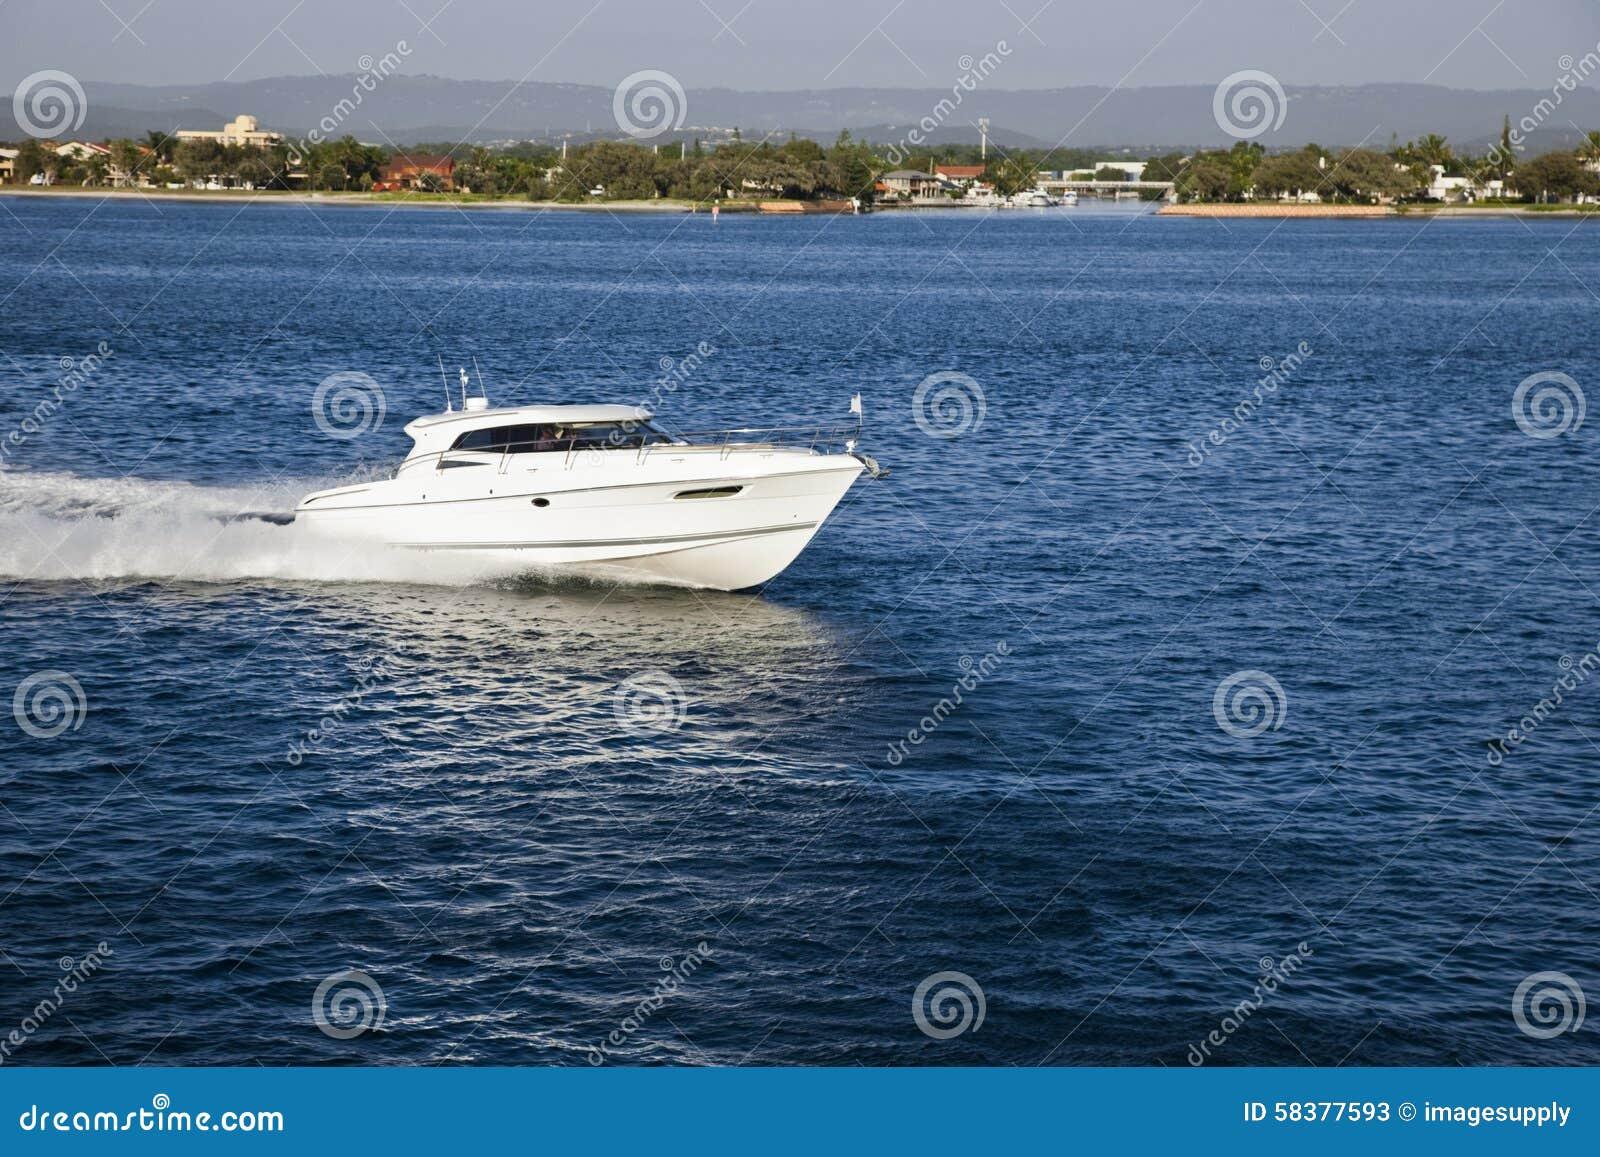 A Small Motor Boat Sailing Close To The Coast Stock Photo